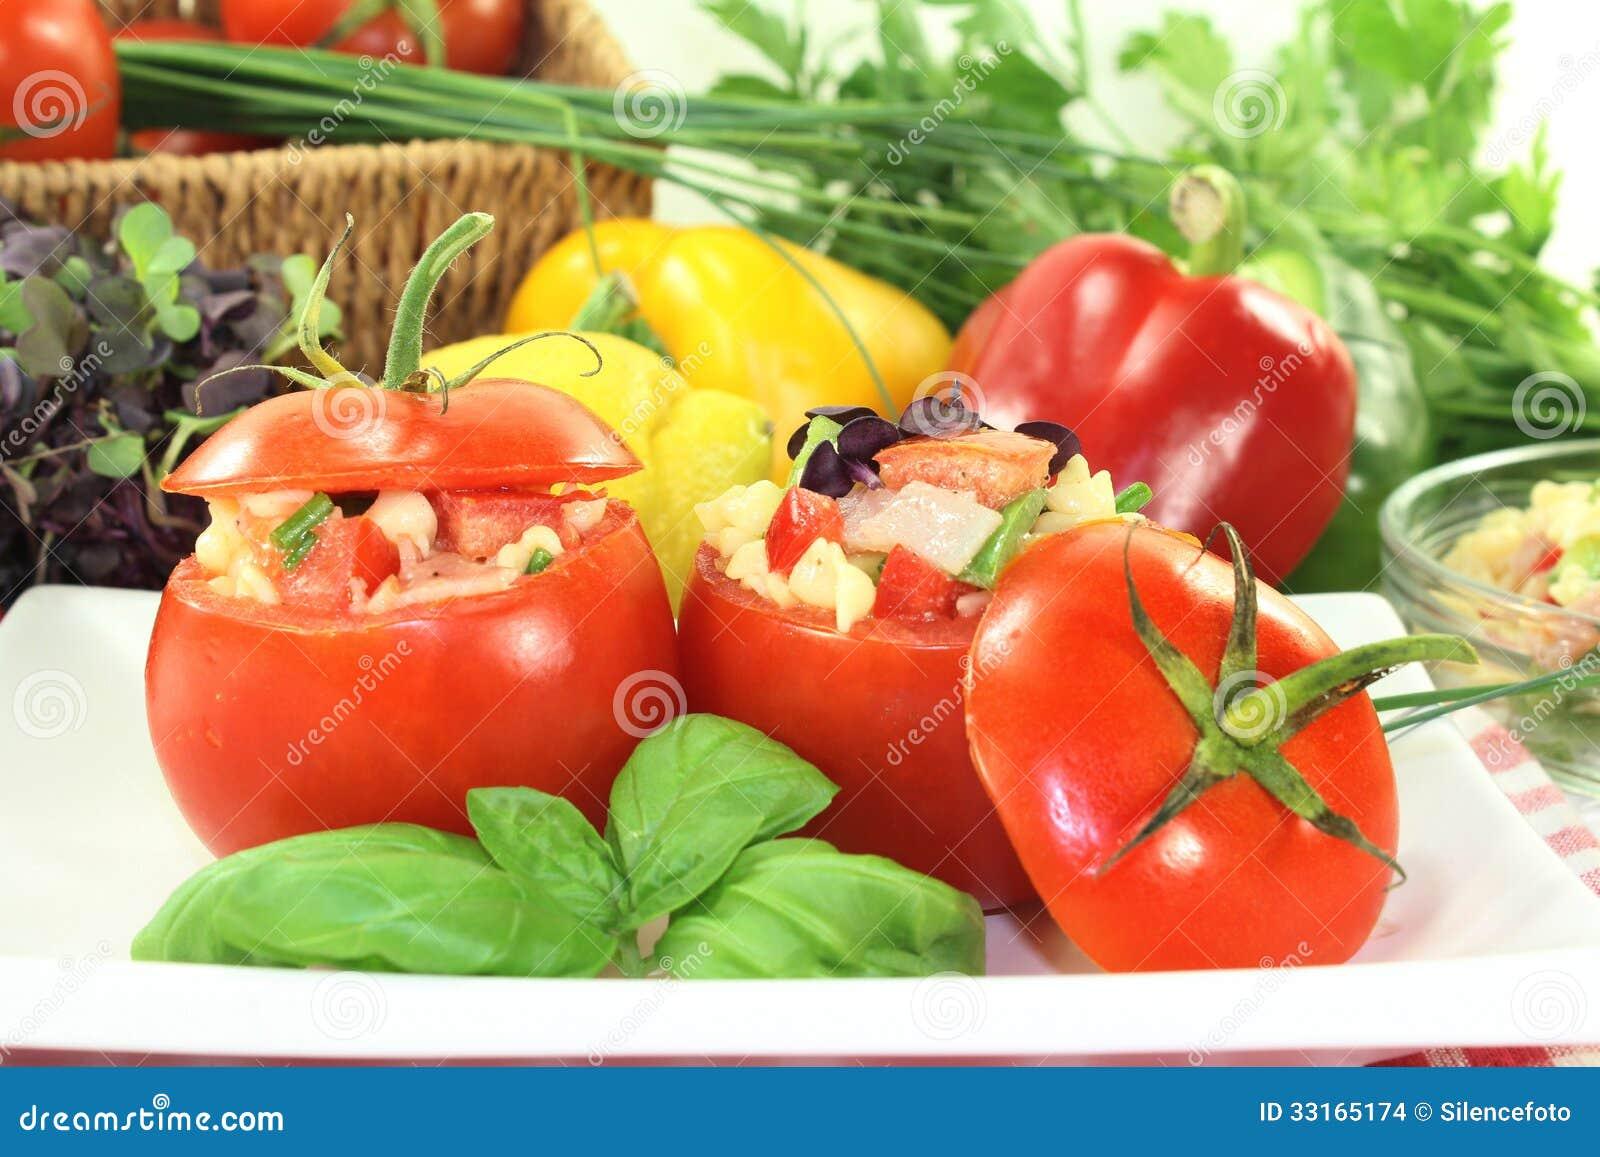 Stuffed Tomatoes Stock Images - Image: 33165174